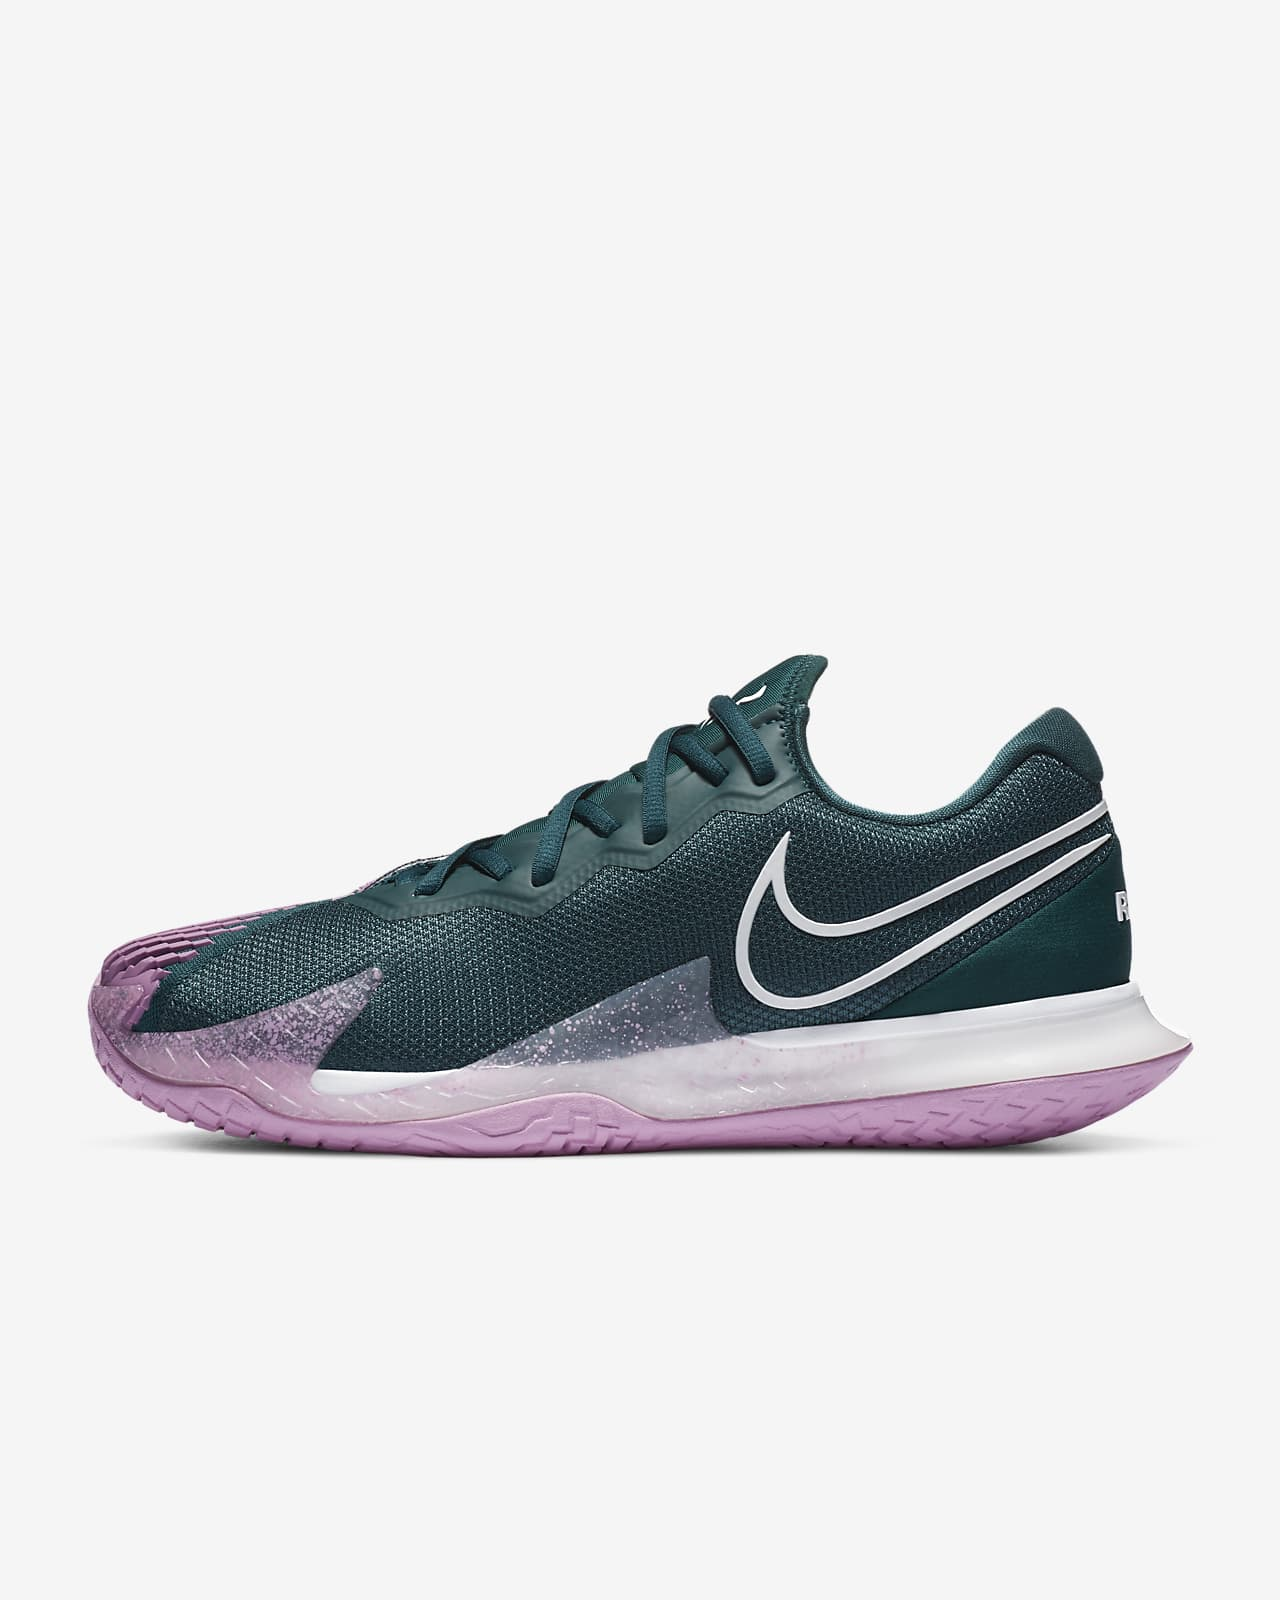 NikeCourt Air Zoom Vapor Cage 4 tennissko for hardcourt til herre